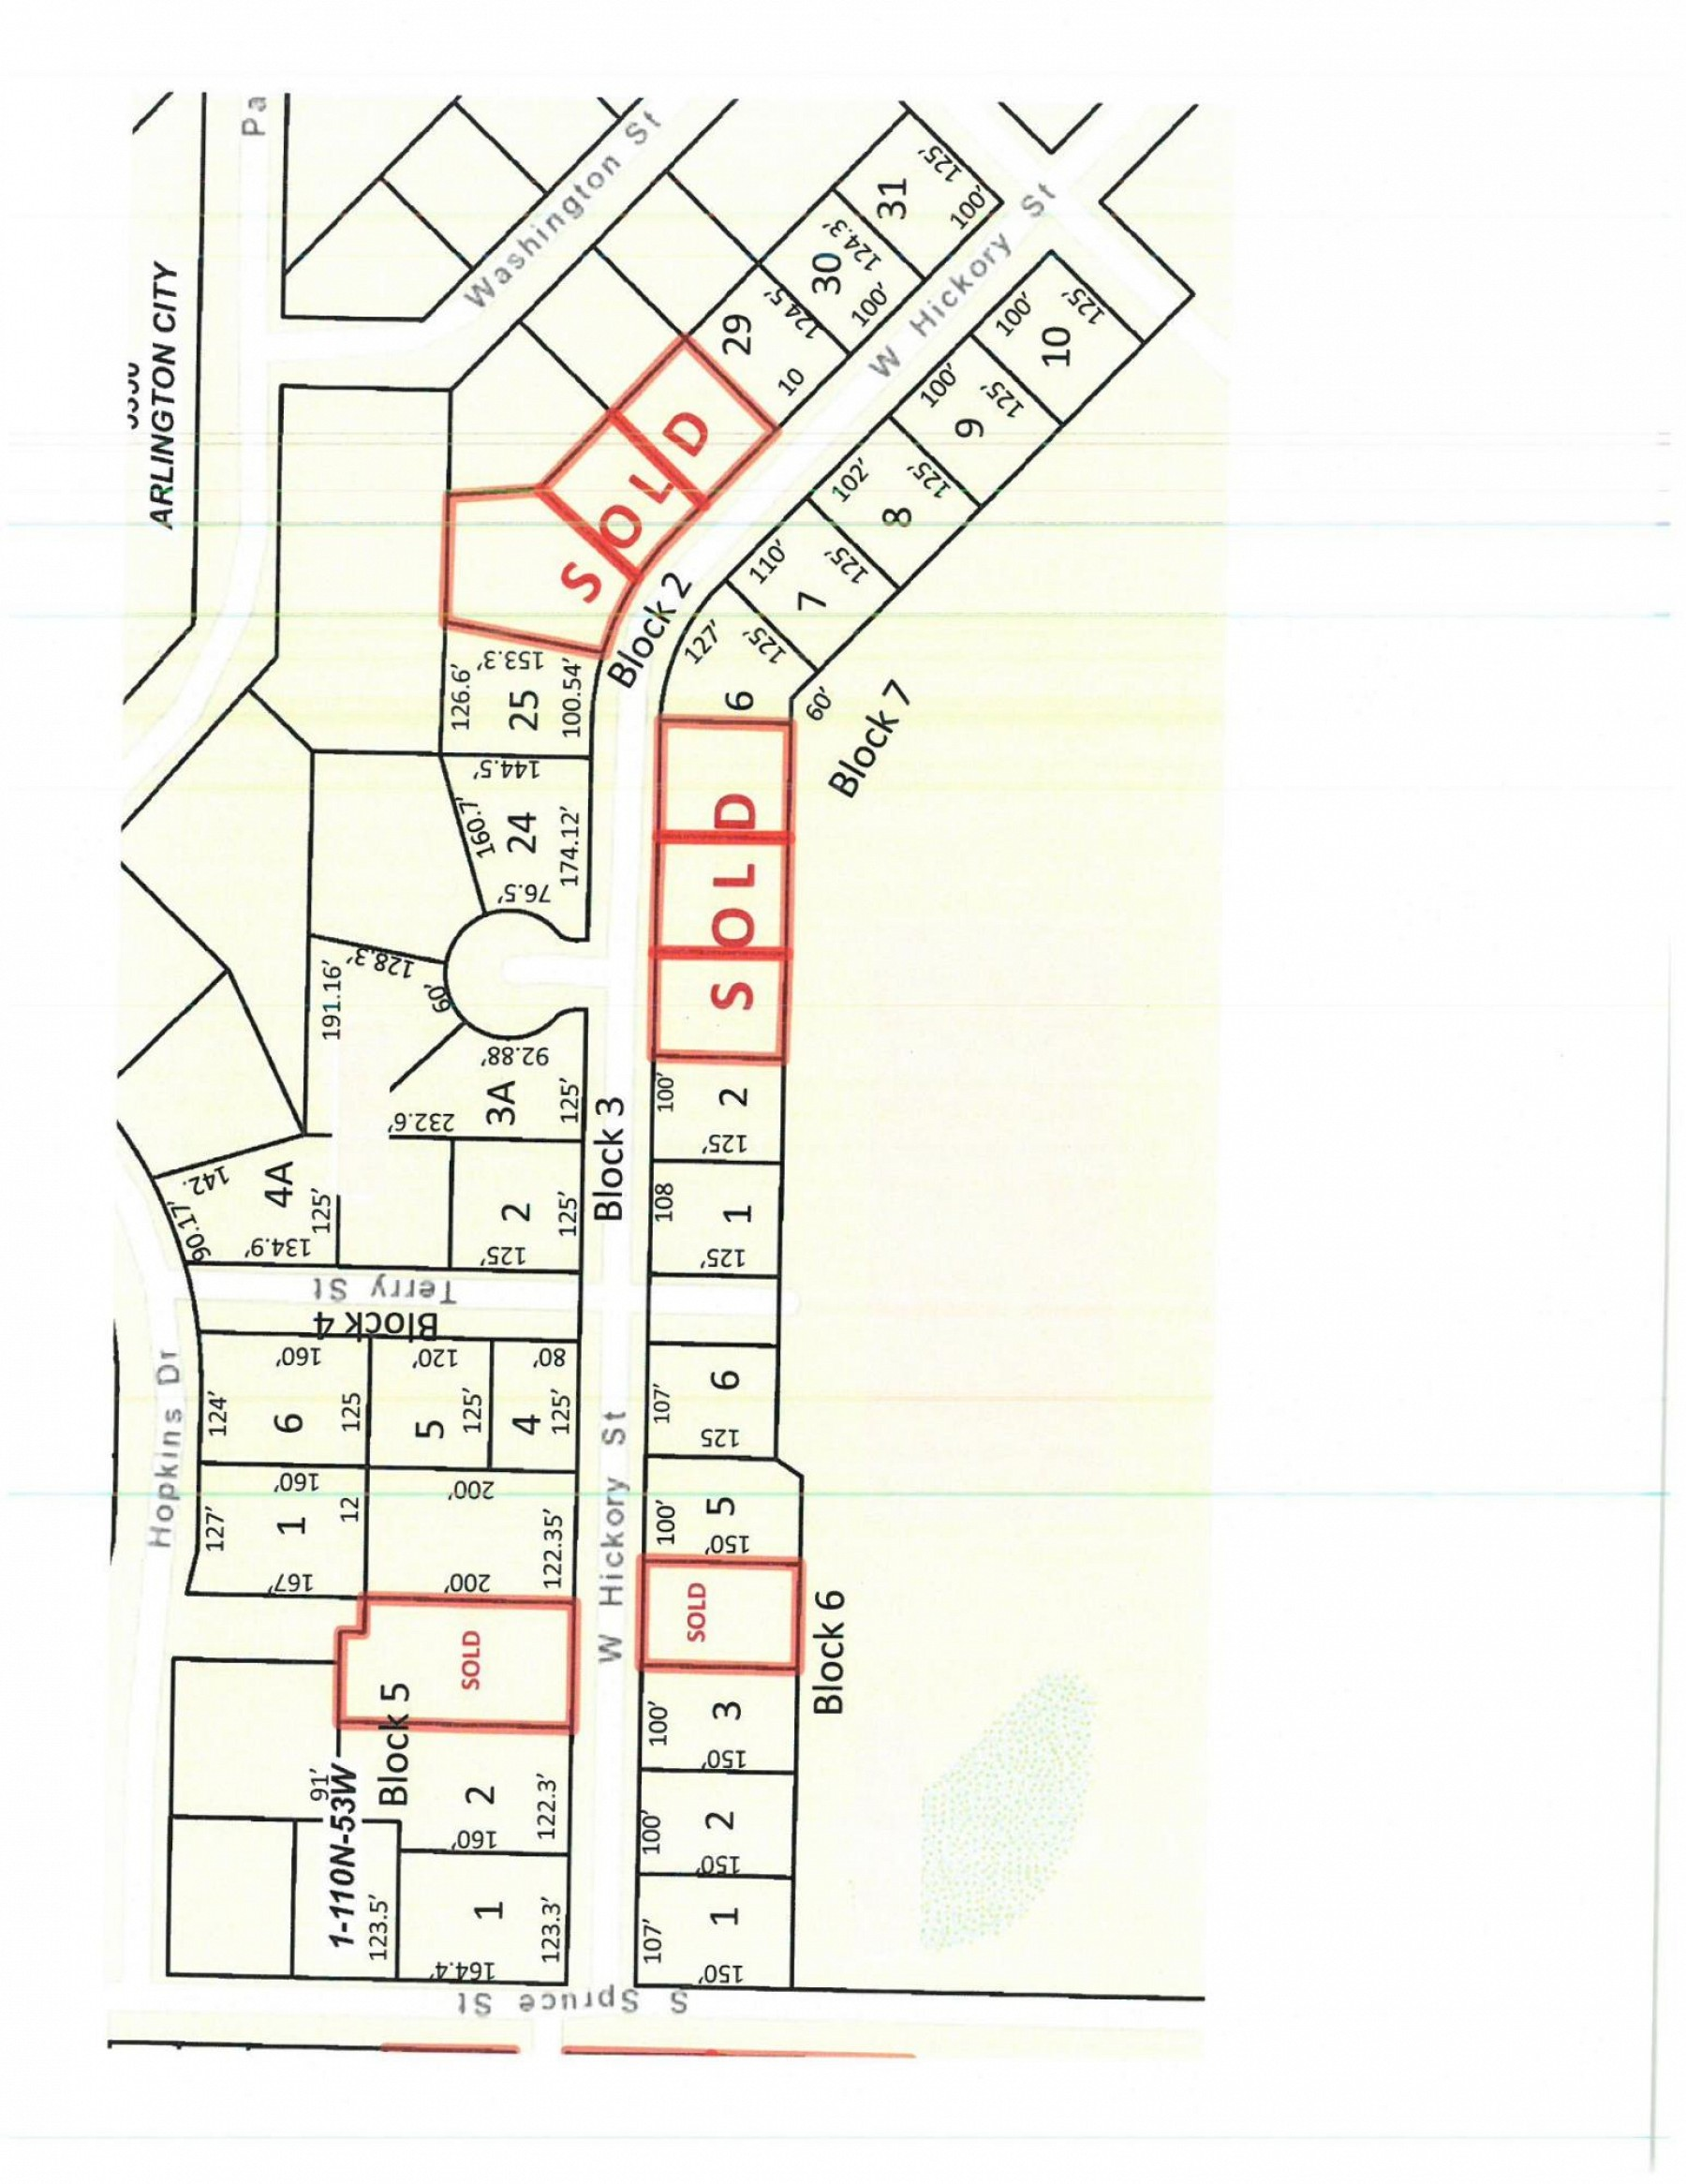 L 2, B 6 Johnson's Addition, Arlington, SD 57212